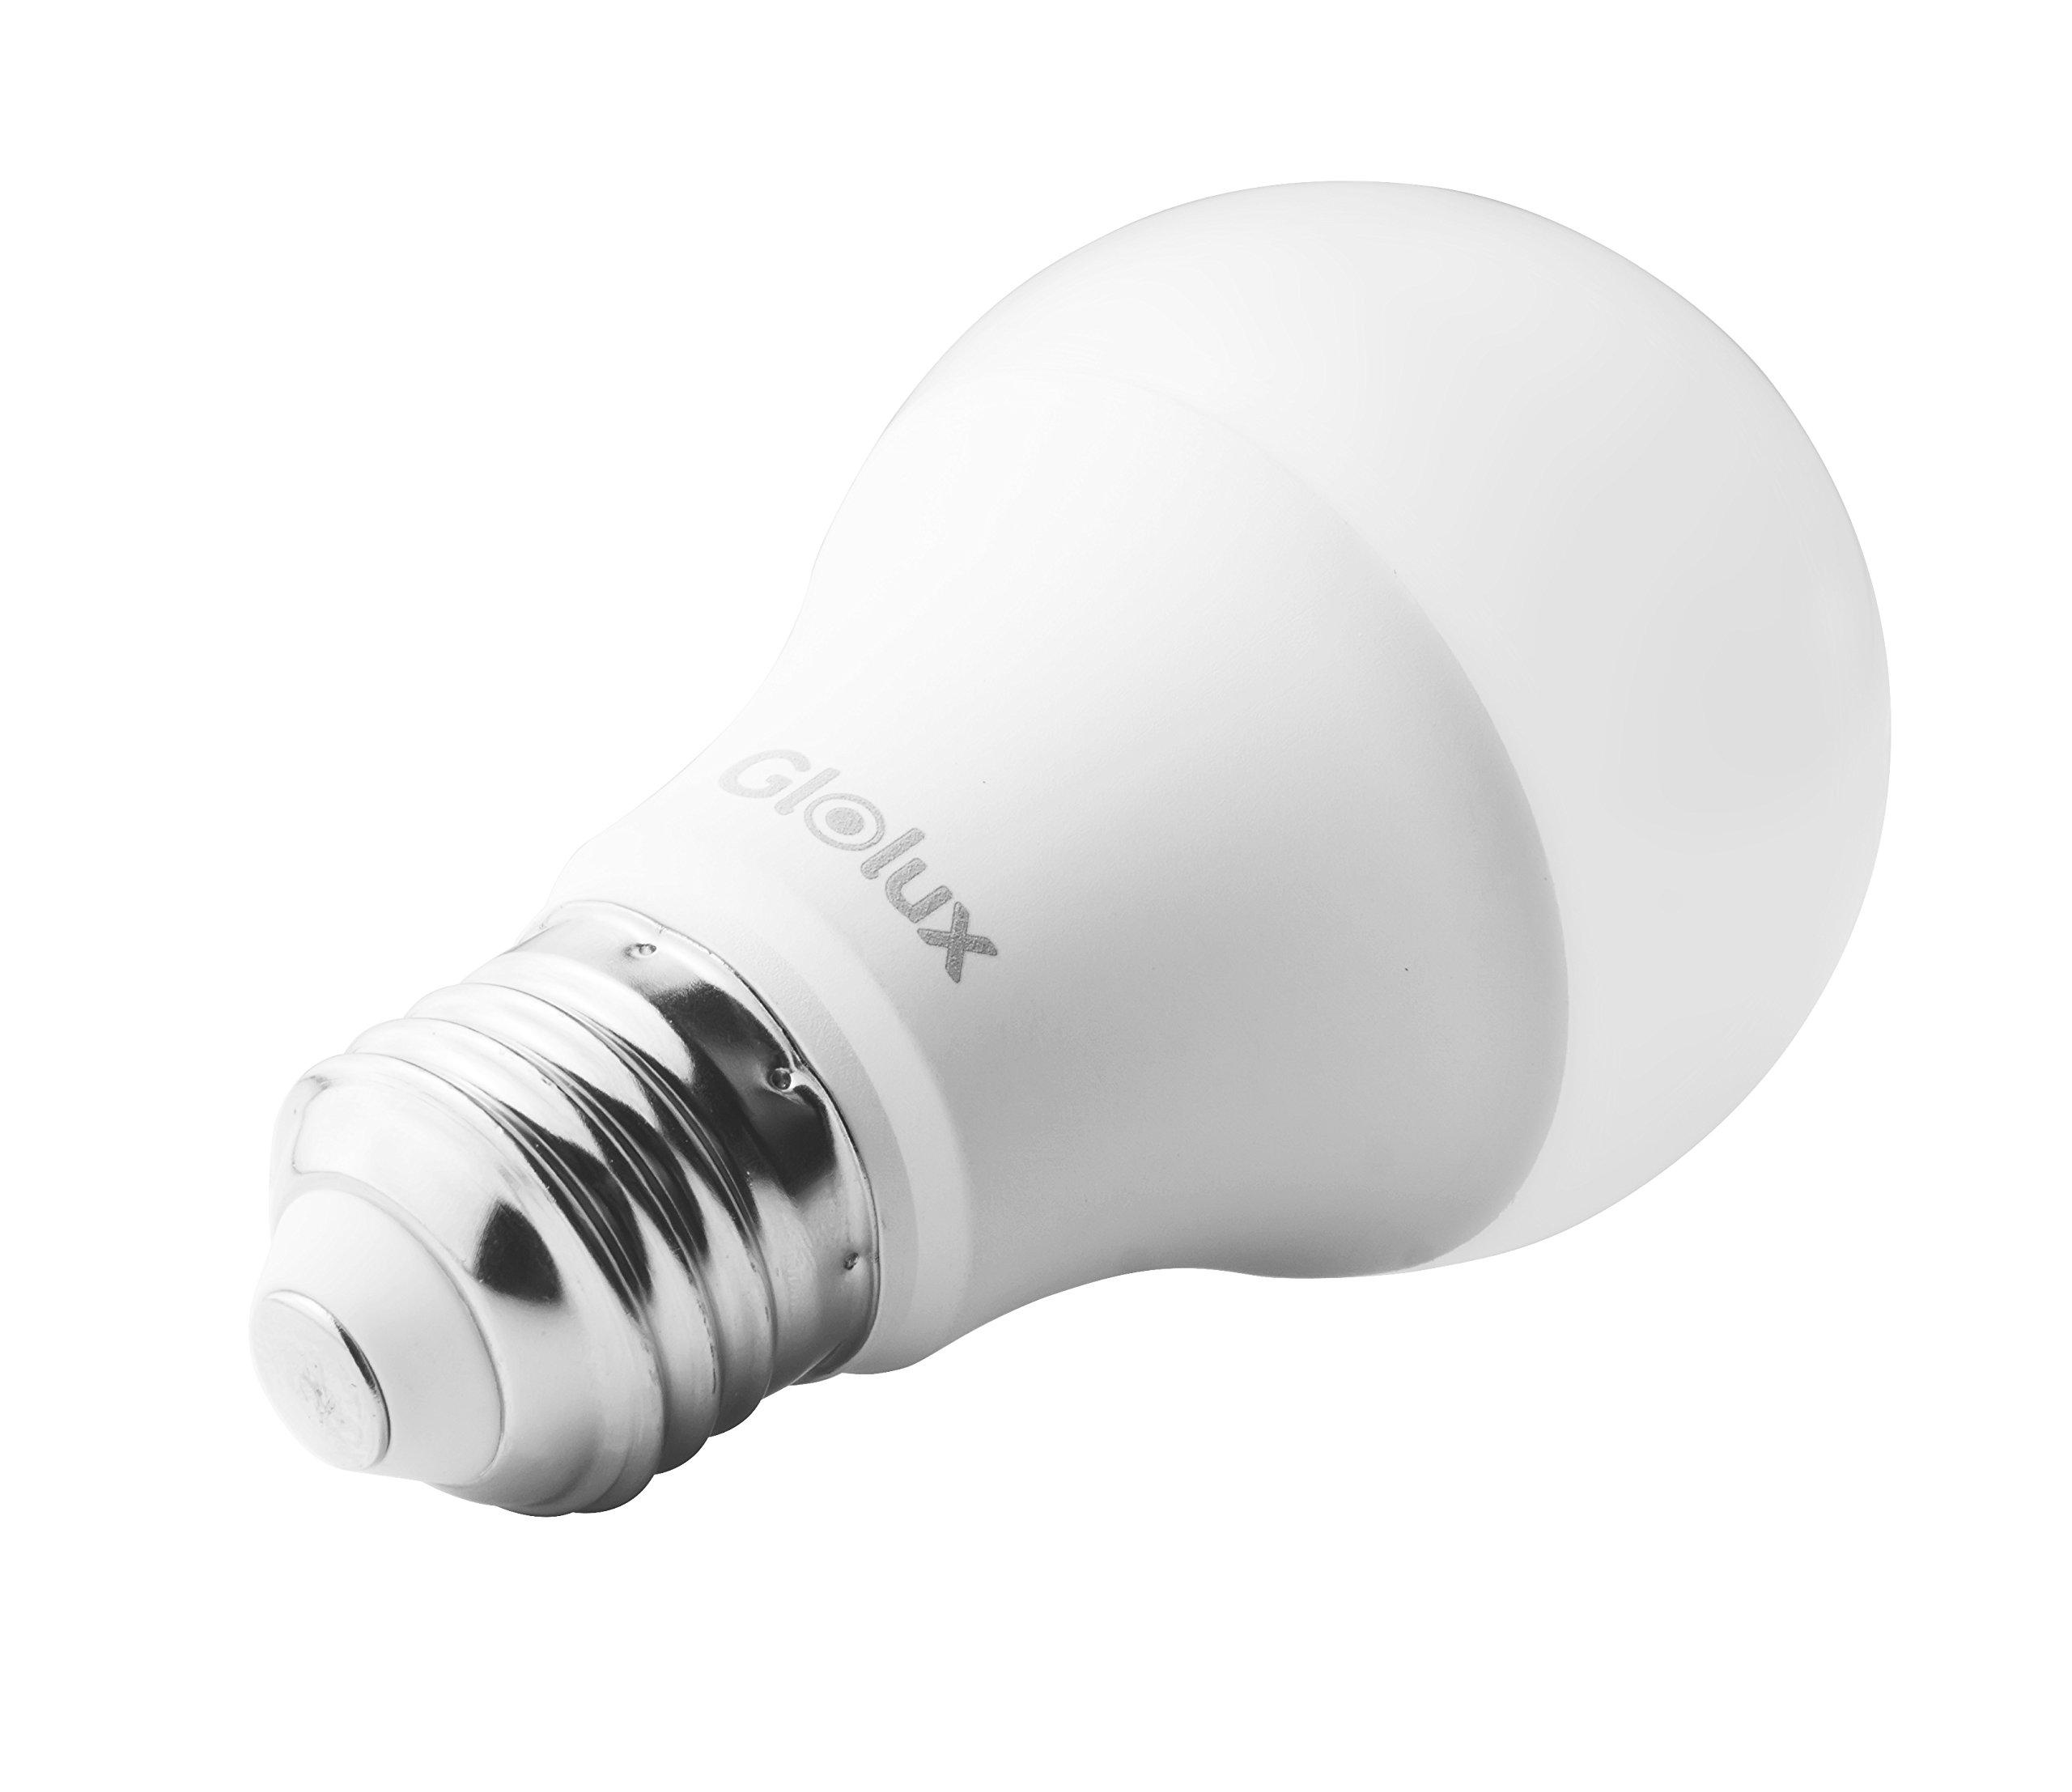 glolux 75 watt equivalent led light bulb 1100 lumen daylight 5000k 11 watt 602938734943 ebay. Black Bedroom Furniture Sets. Home Design Ideas